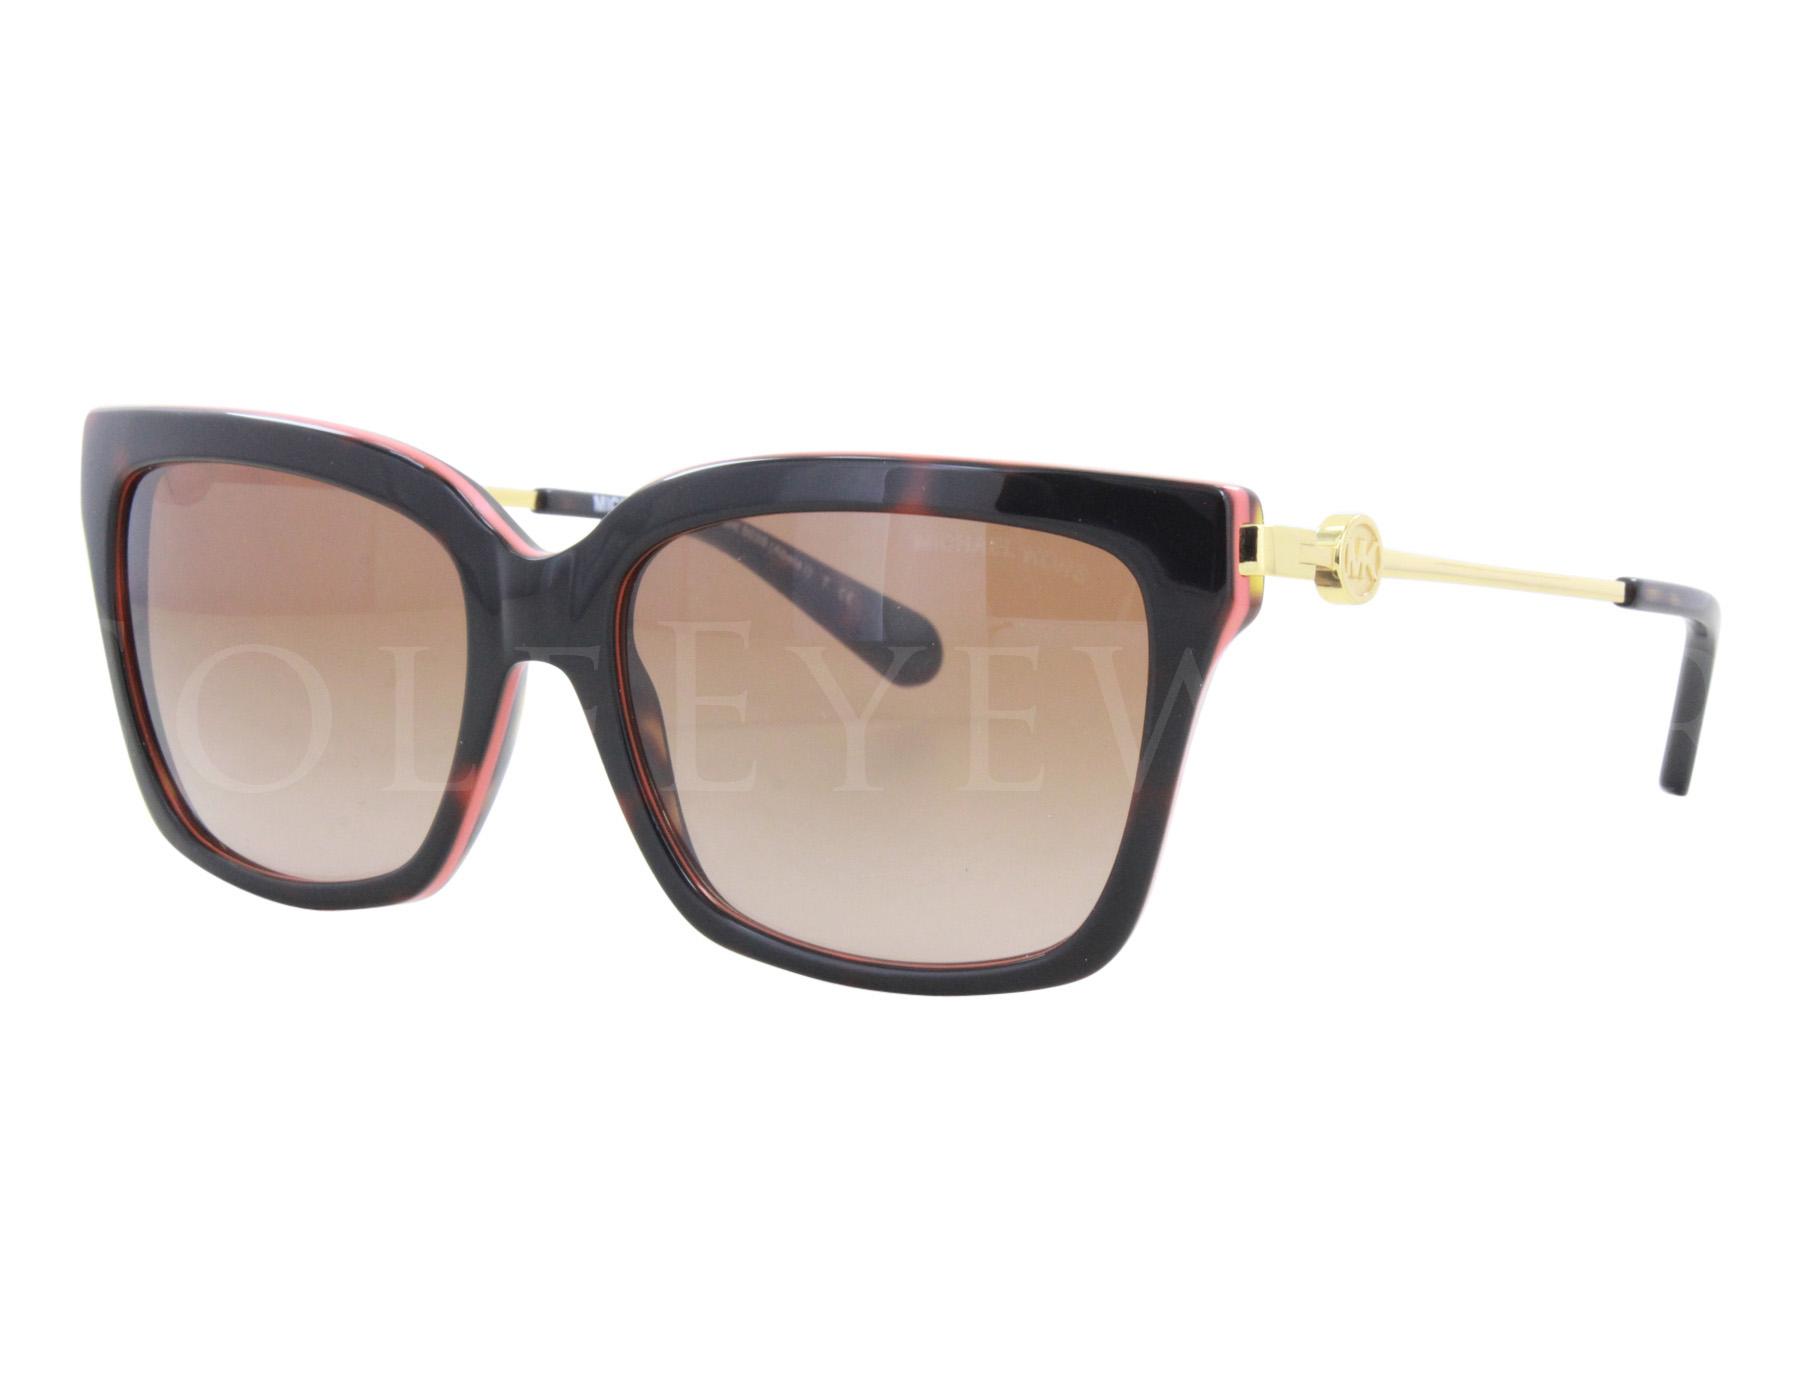 3c9c5a74a7 Details about NEW Michael Kors MK 6038 313013 Tortoise Orange   Brown  Sunglasses